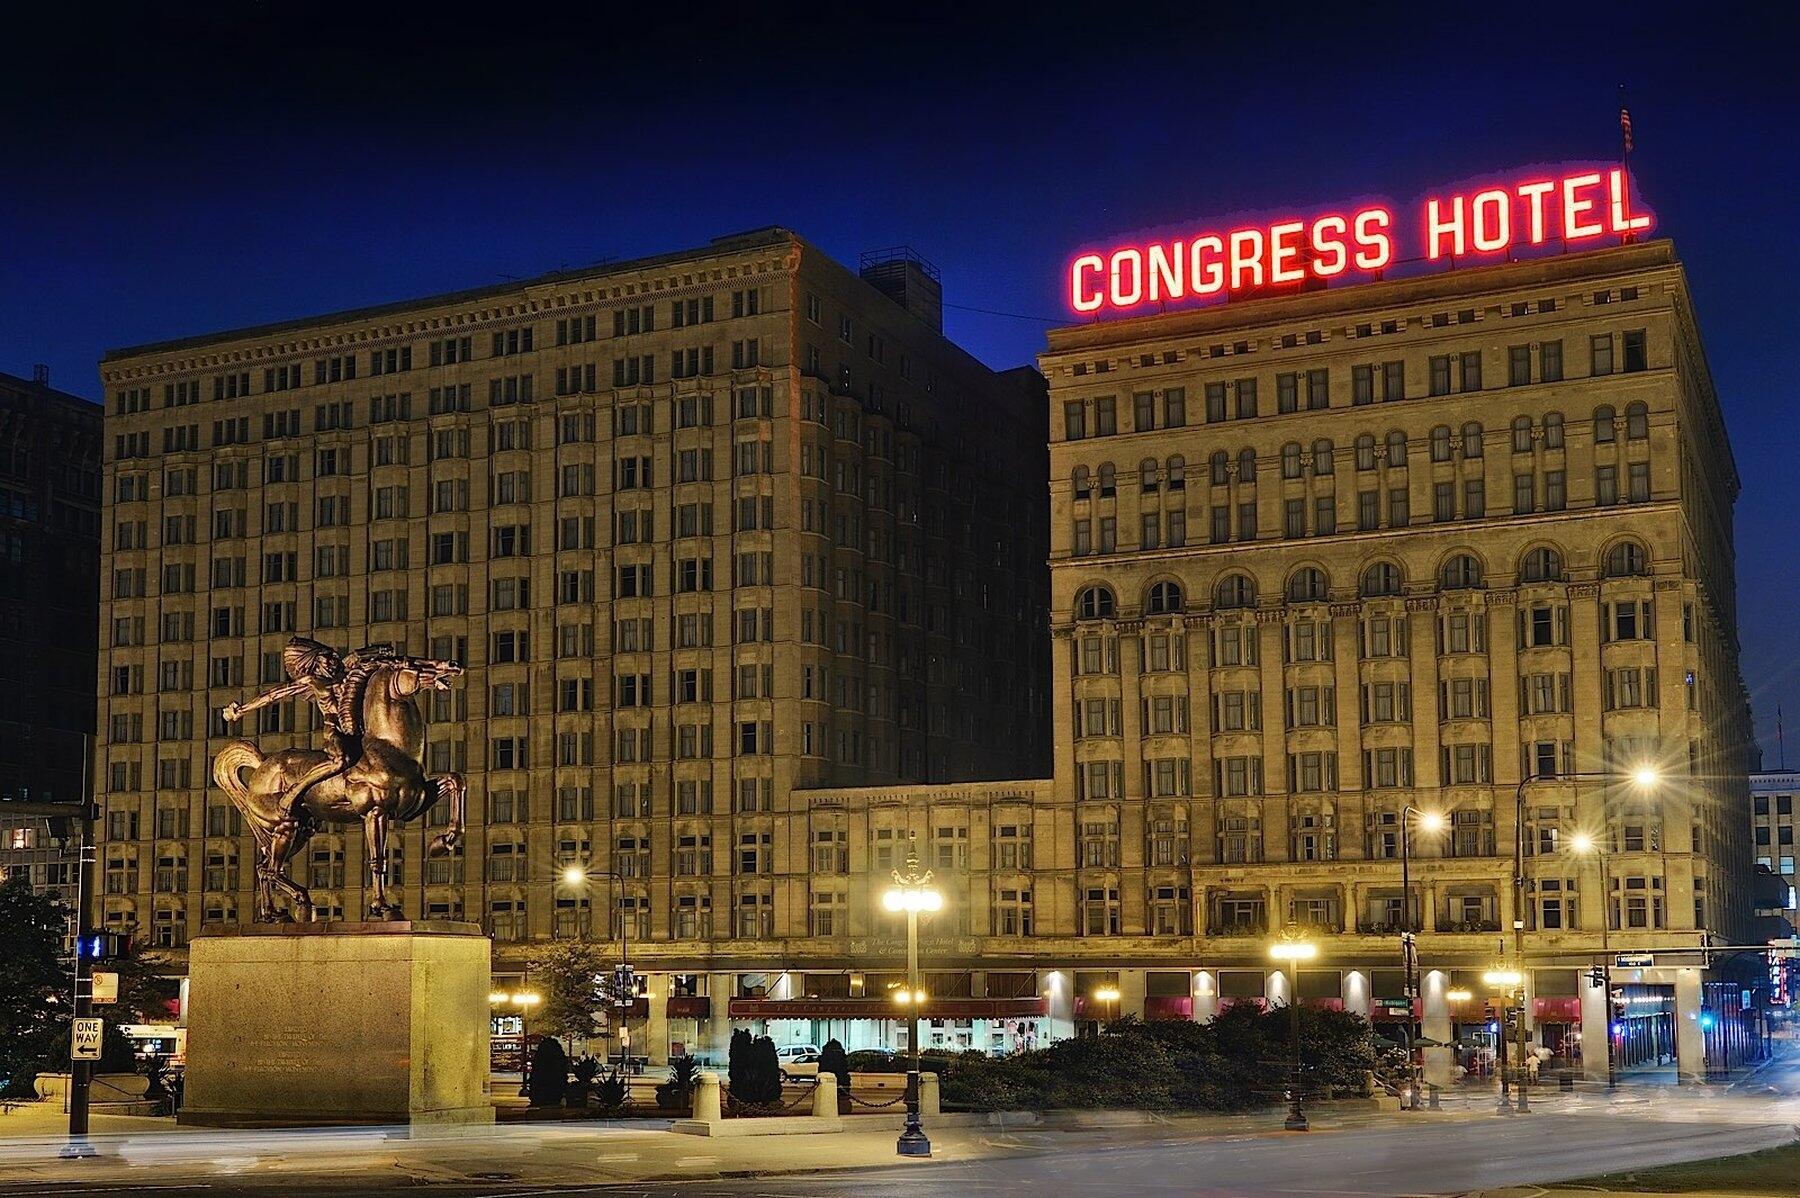 Congress Plaza Hotel Exterior at night